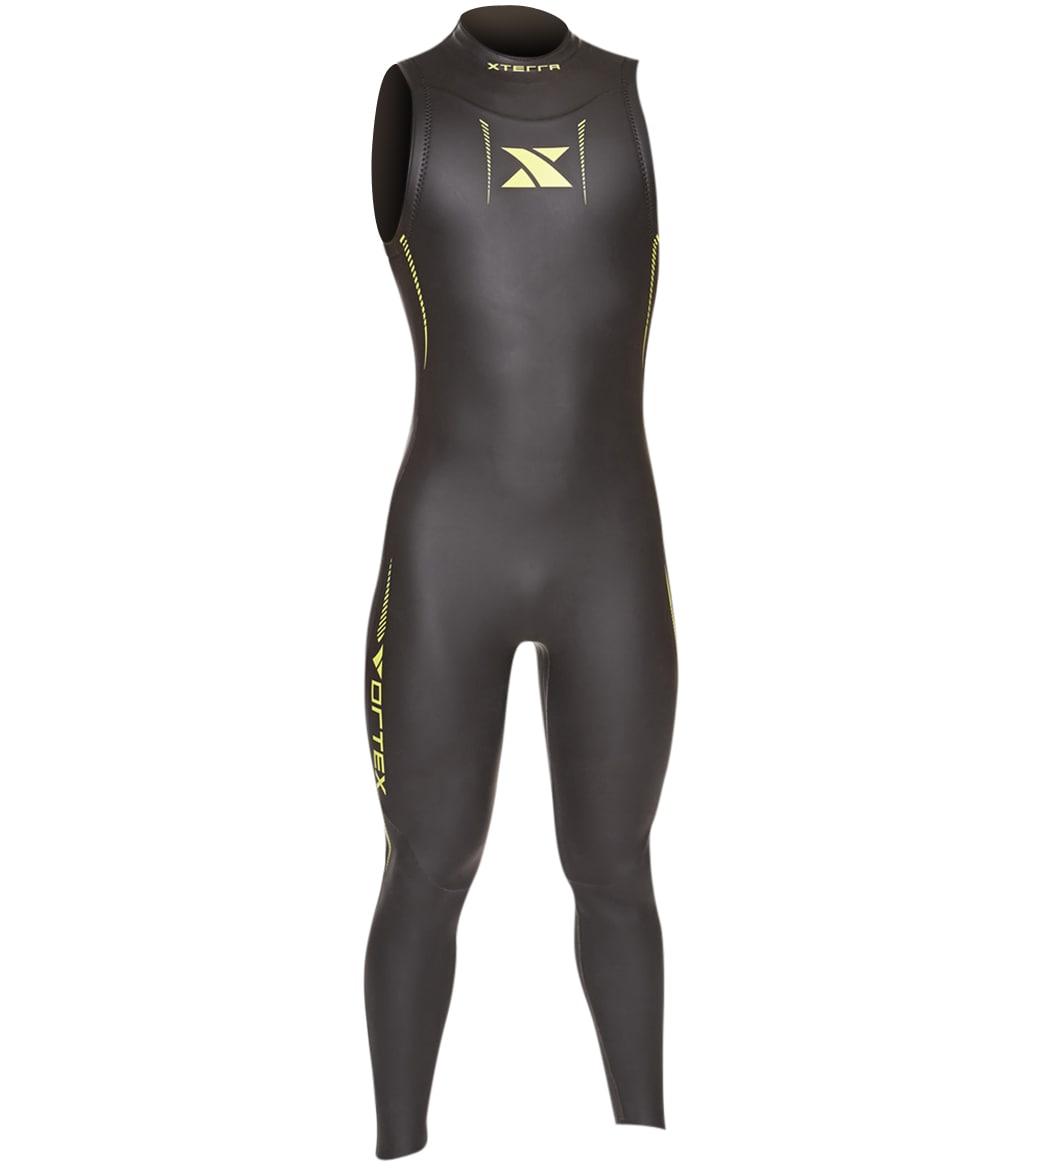 Xterra Vortex Open Water Sleeveless Wetsuit